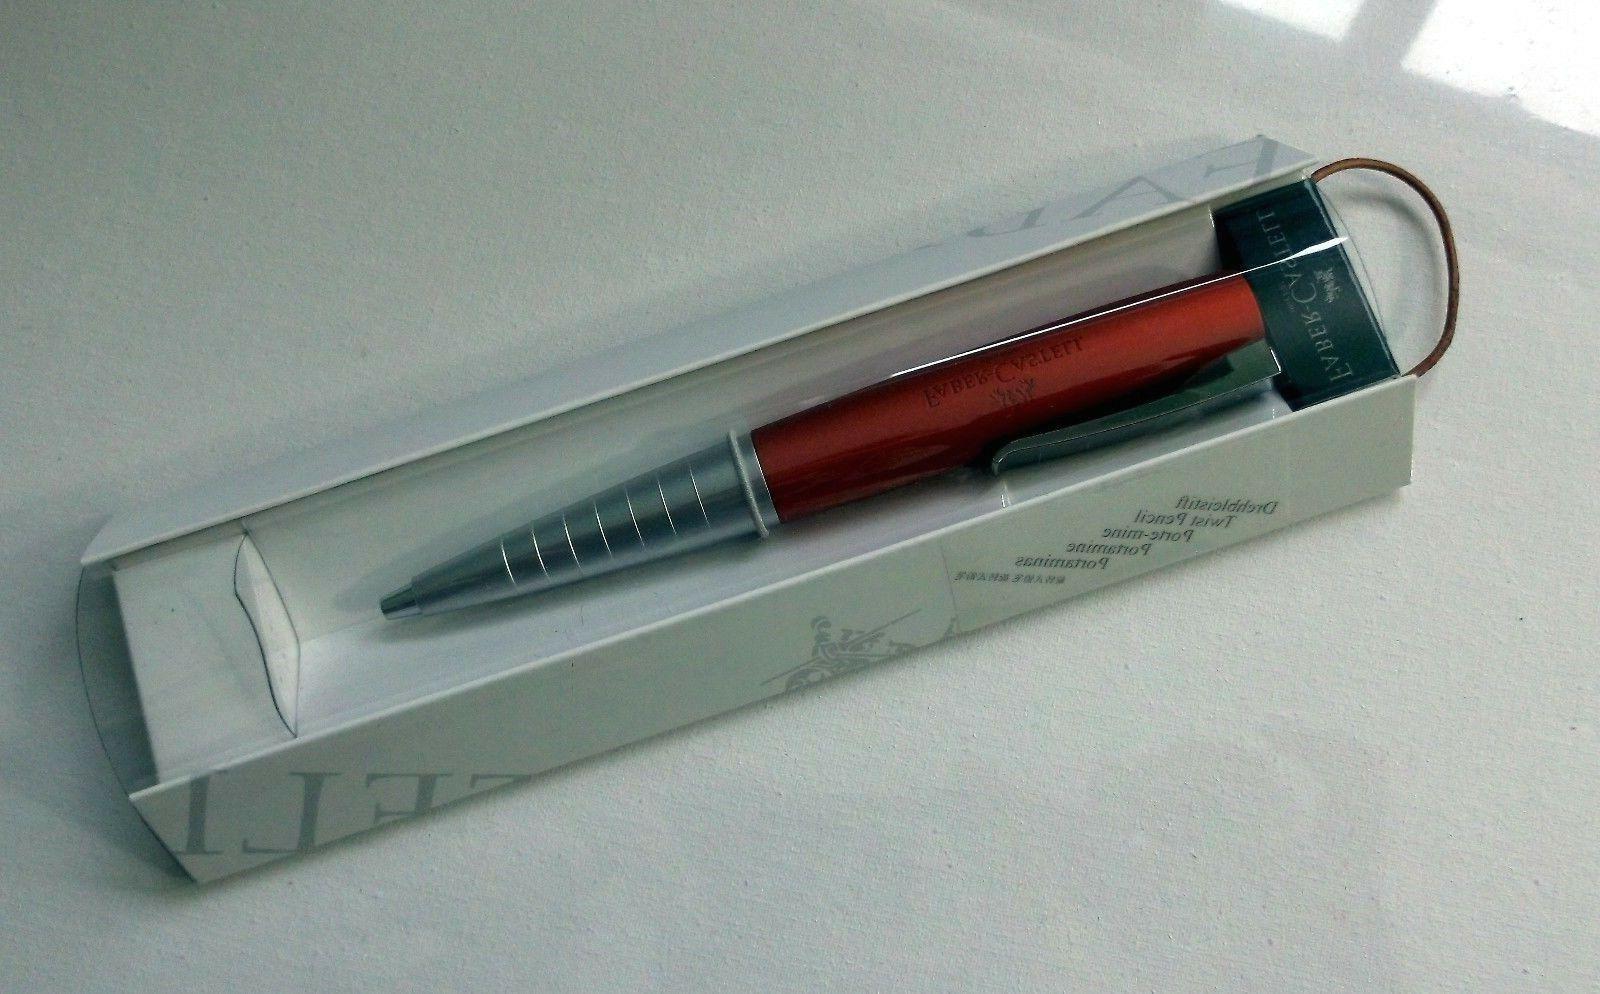 FABER-CASTELL Retractable Pencil Metallic